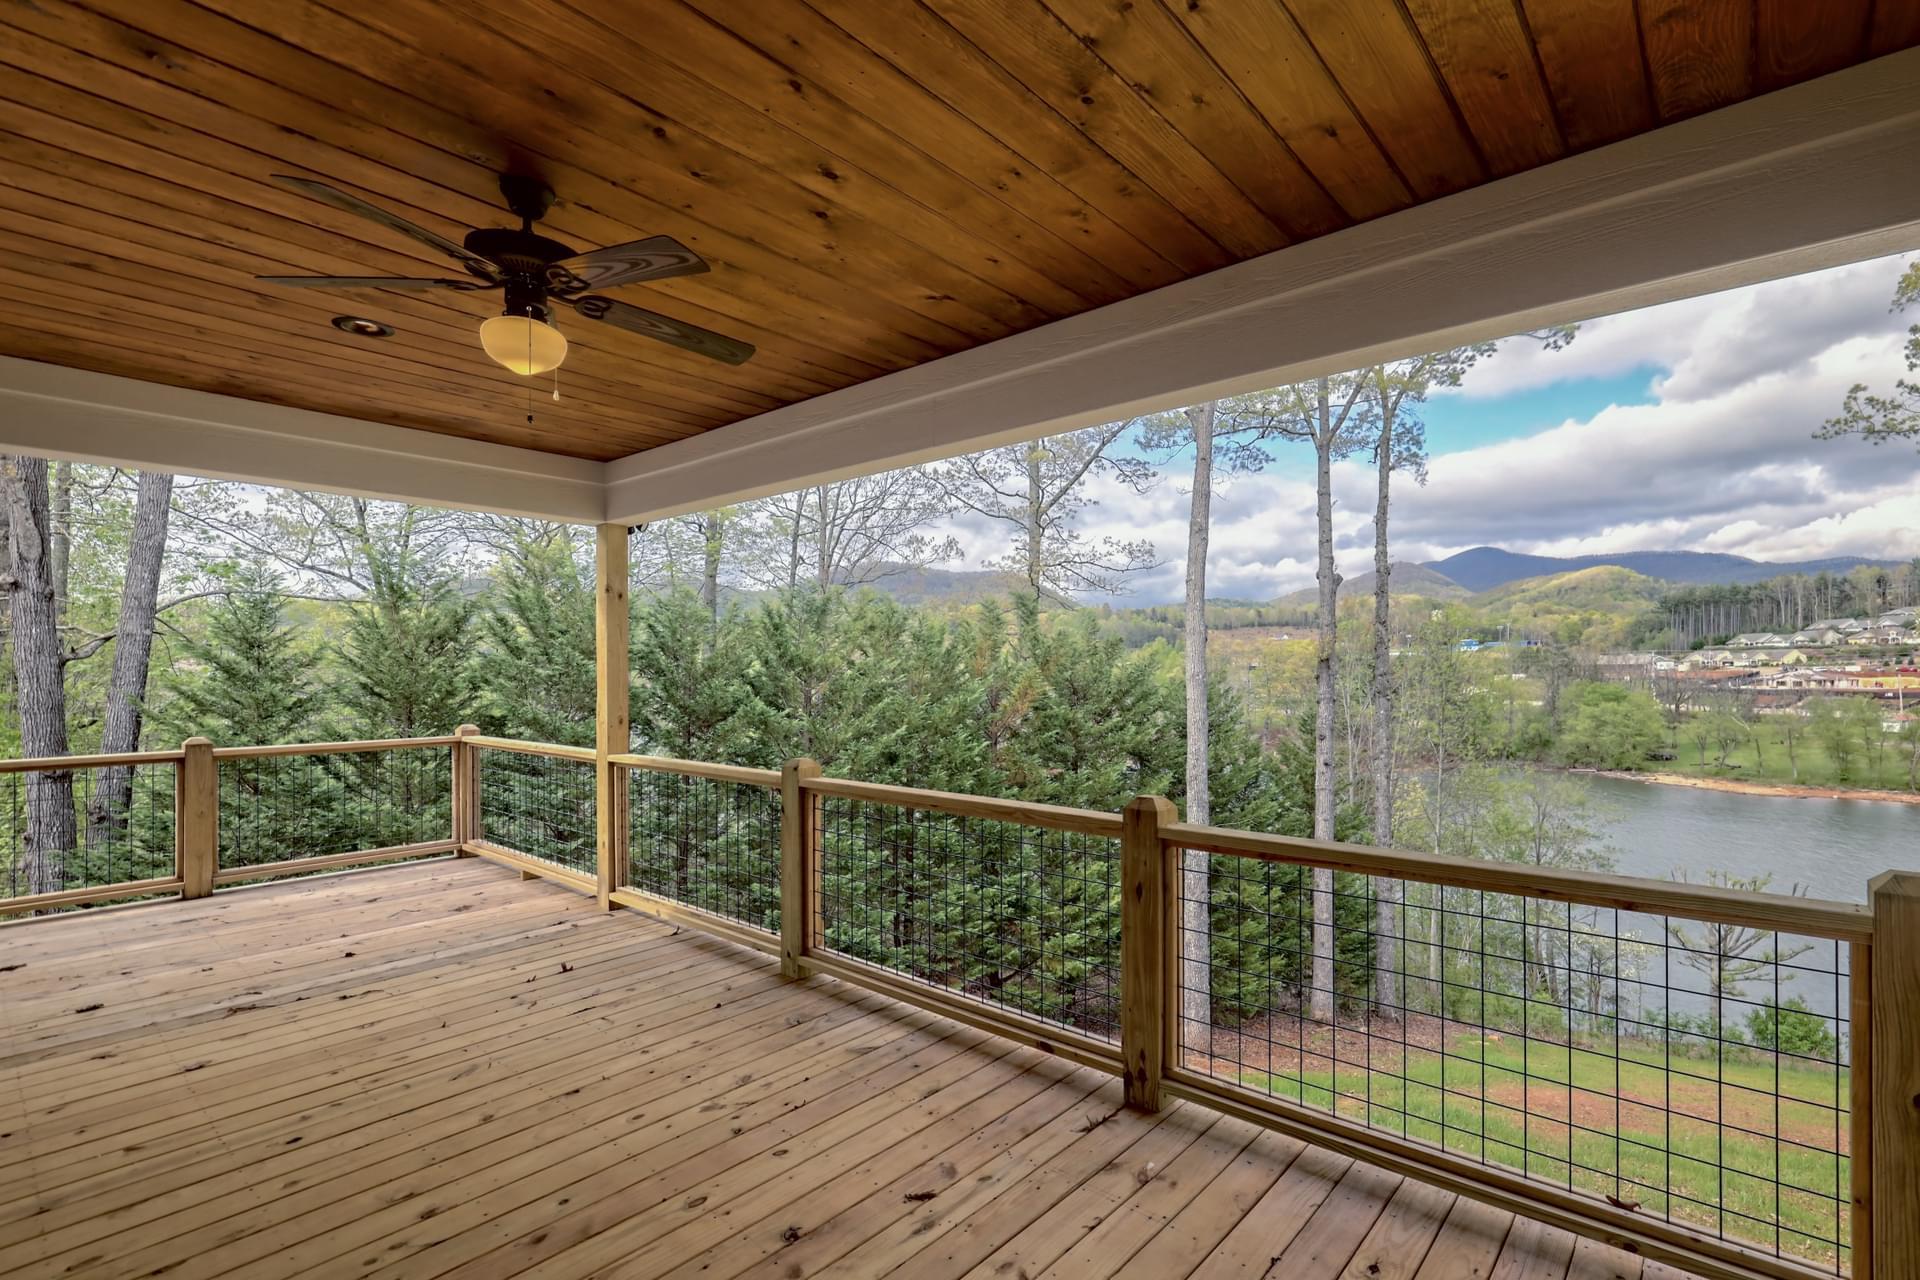 Breathtaking Backyards: 5 Ways to Enjoy your Custom Outdoor Fireplace